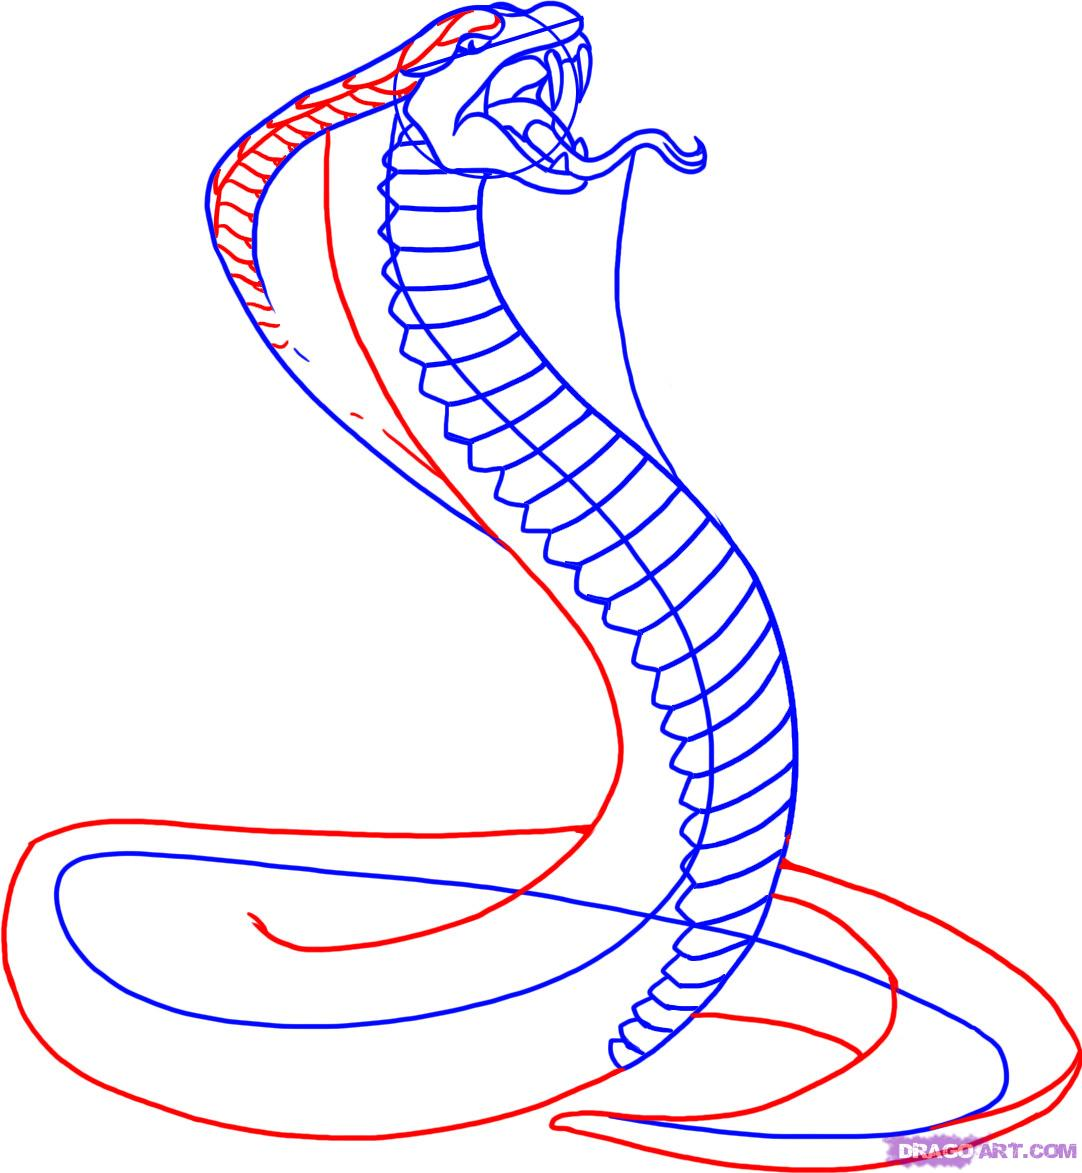 Drawn cobra Free How To Free Snakes